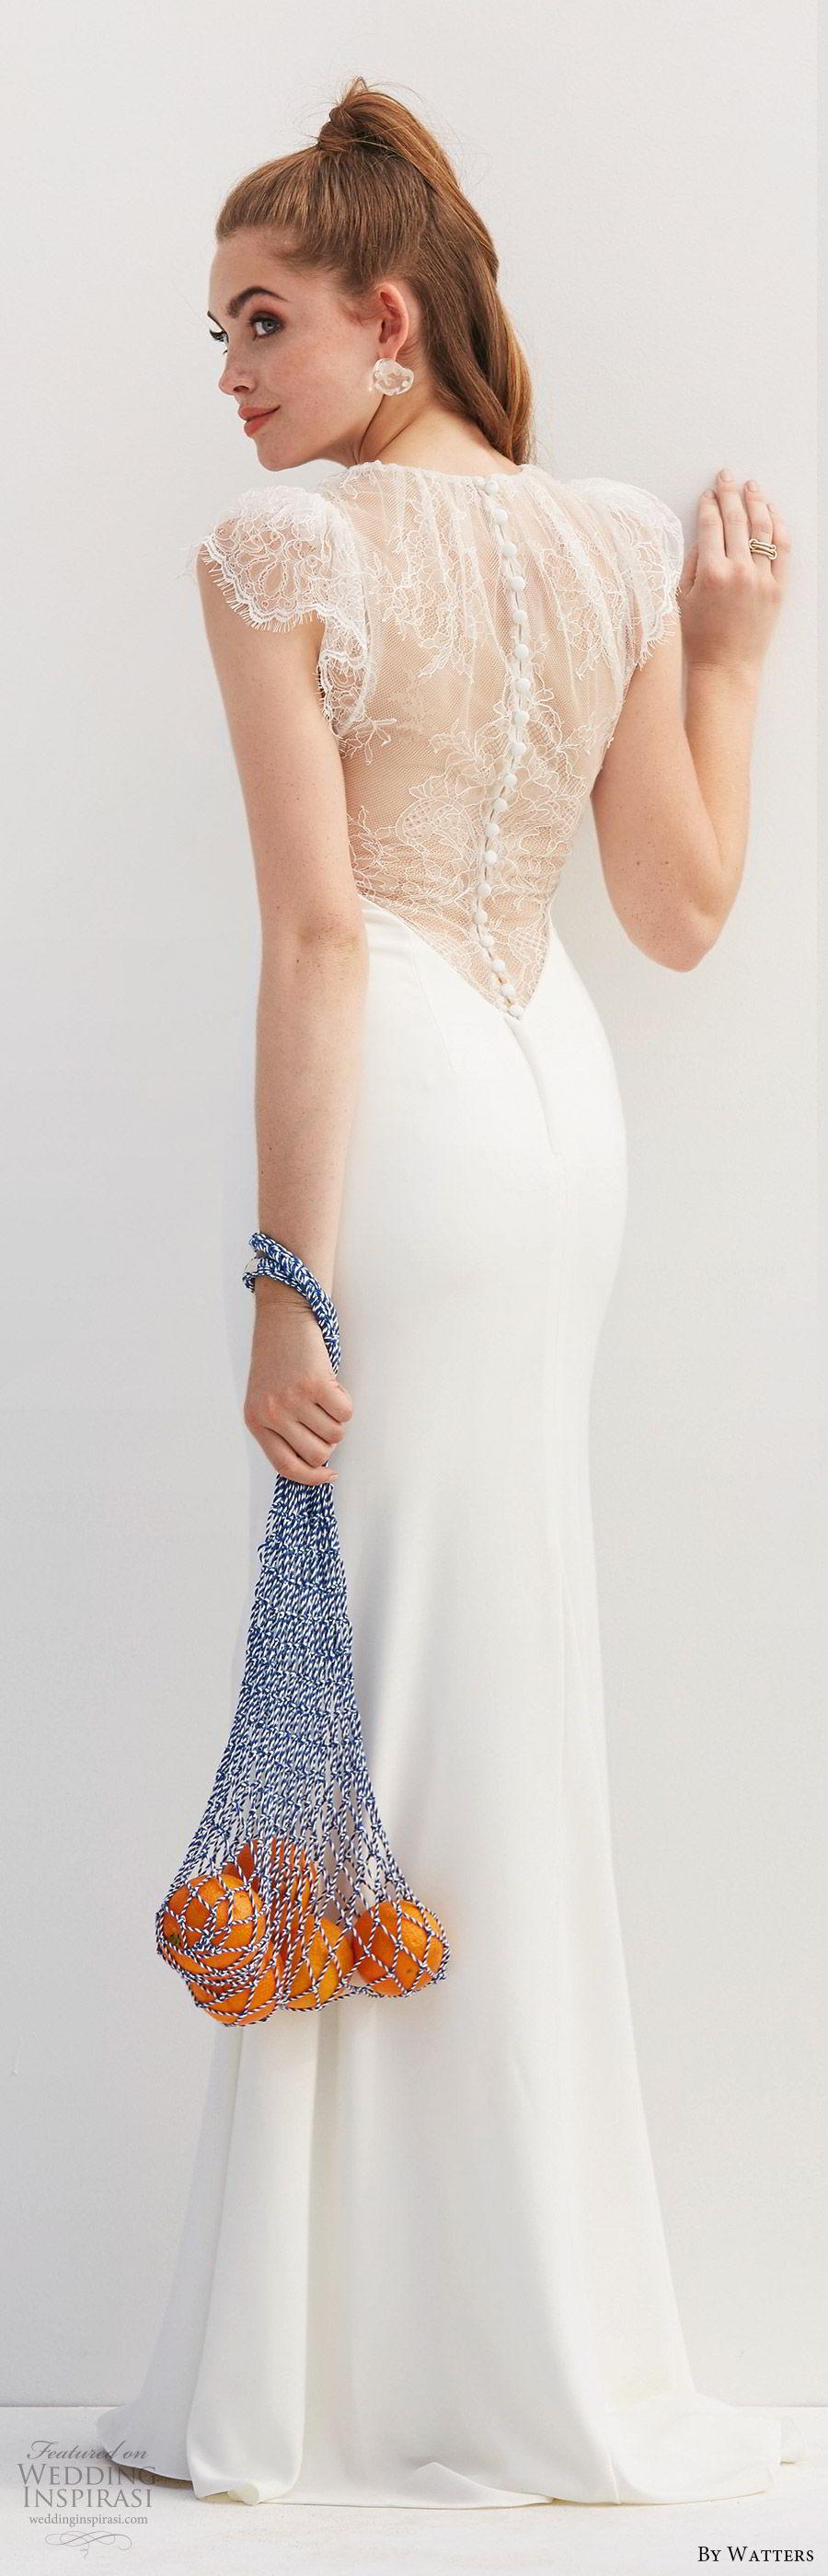 by watters 2020 bridal lace cap sleeves illusion jewel neck v neckline minimally embellished sheath wedding dress (11) illusion back elegant clean chic bv